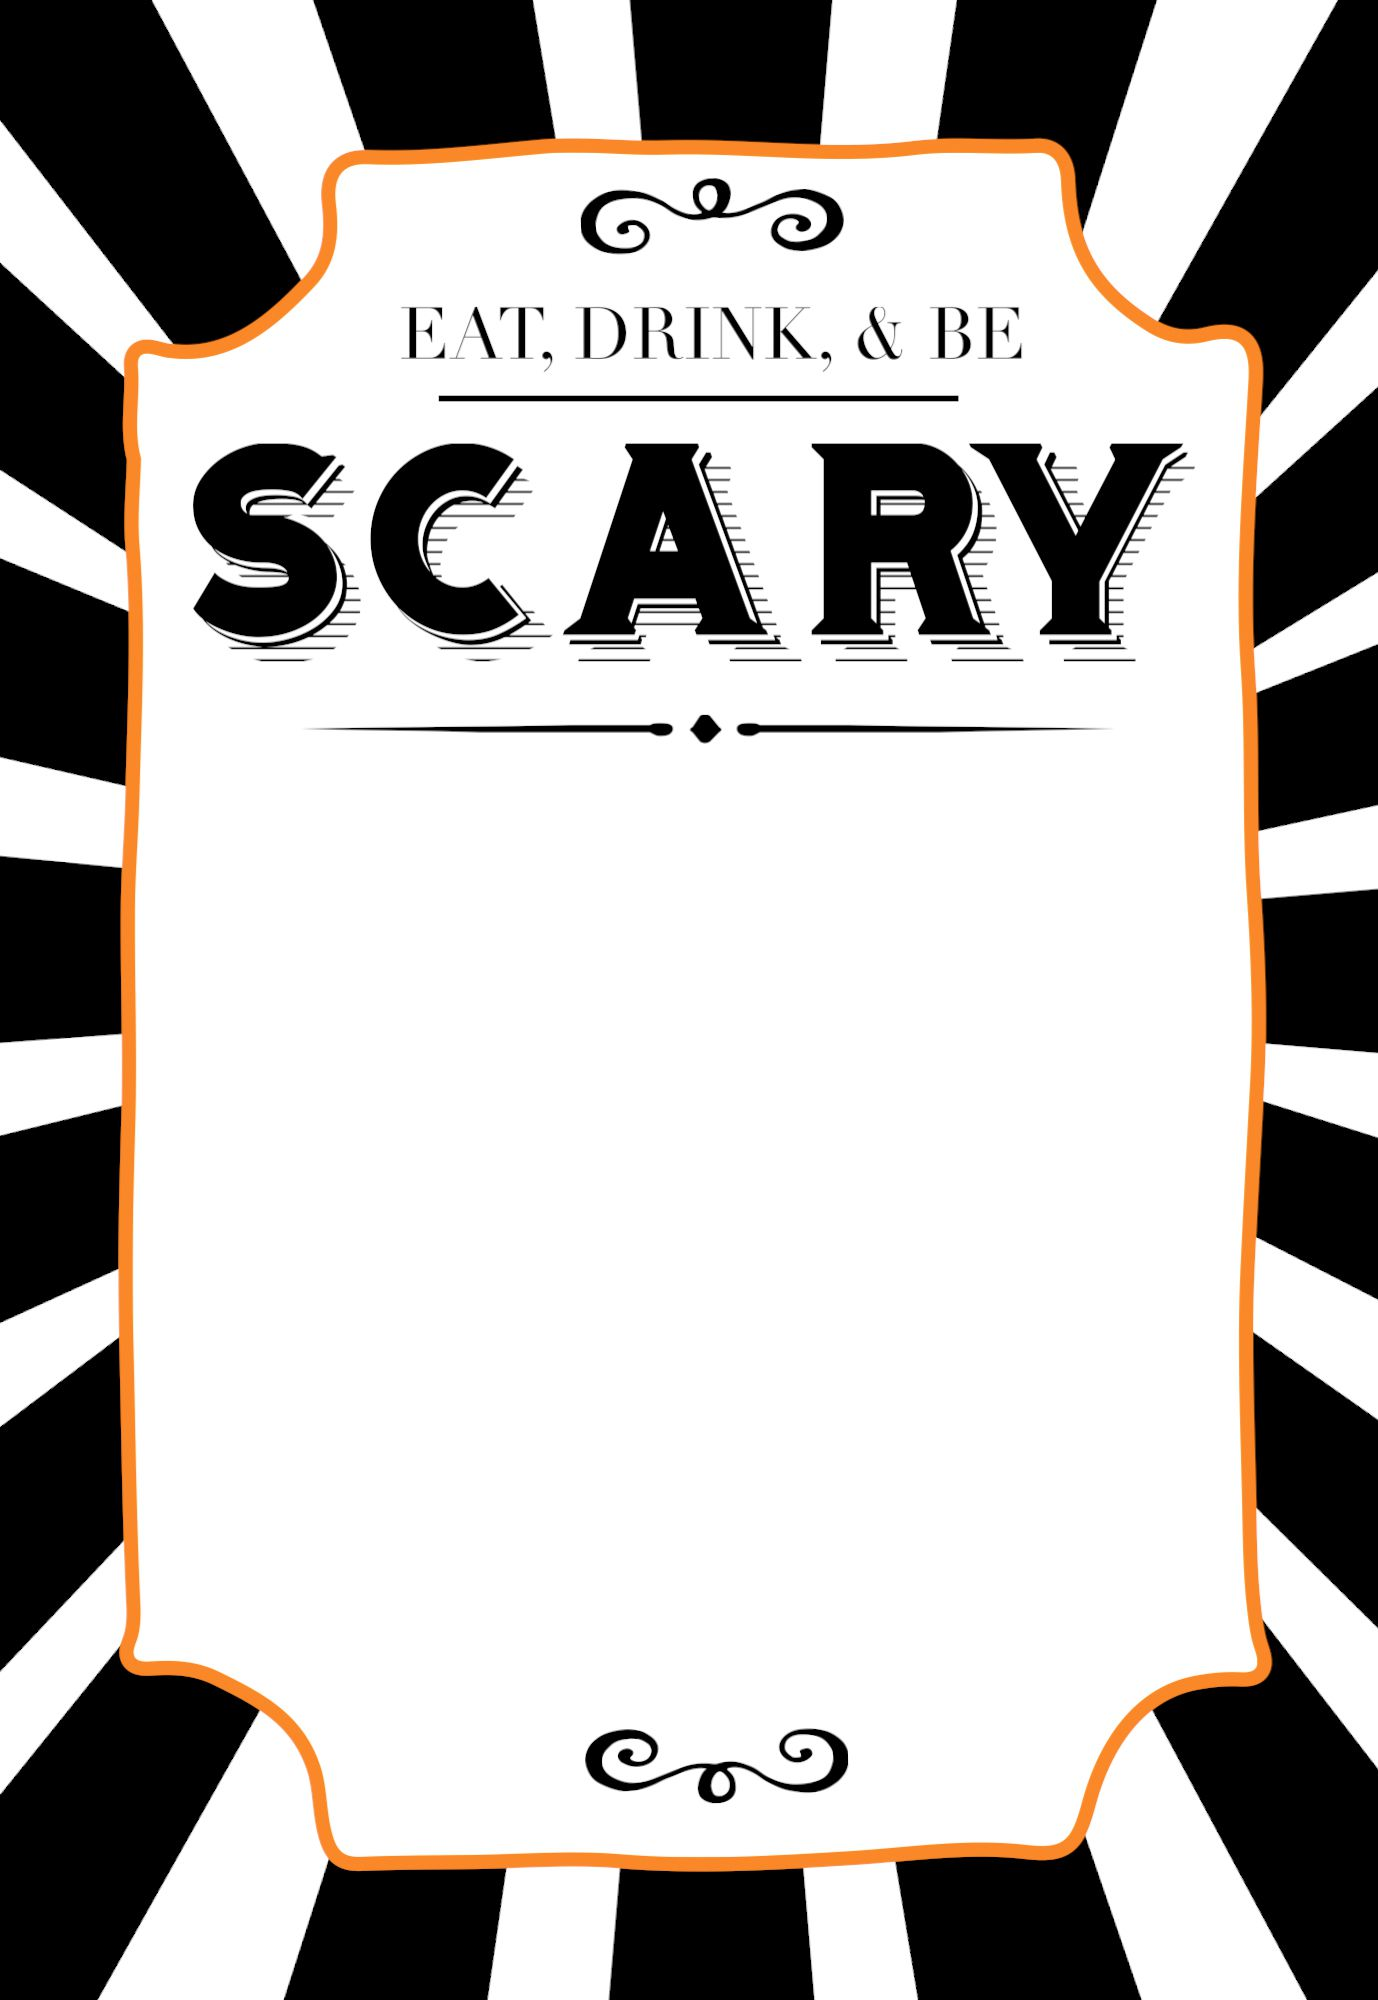 015 Fantastic Free Halloween Invitation Template Highest Quality  Templates Microsoft Word Wedding Printable PartyFull